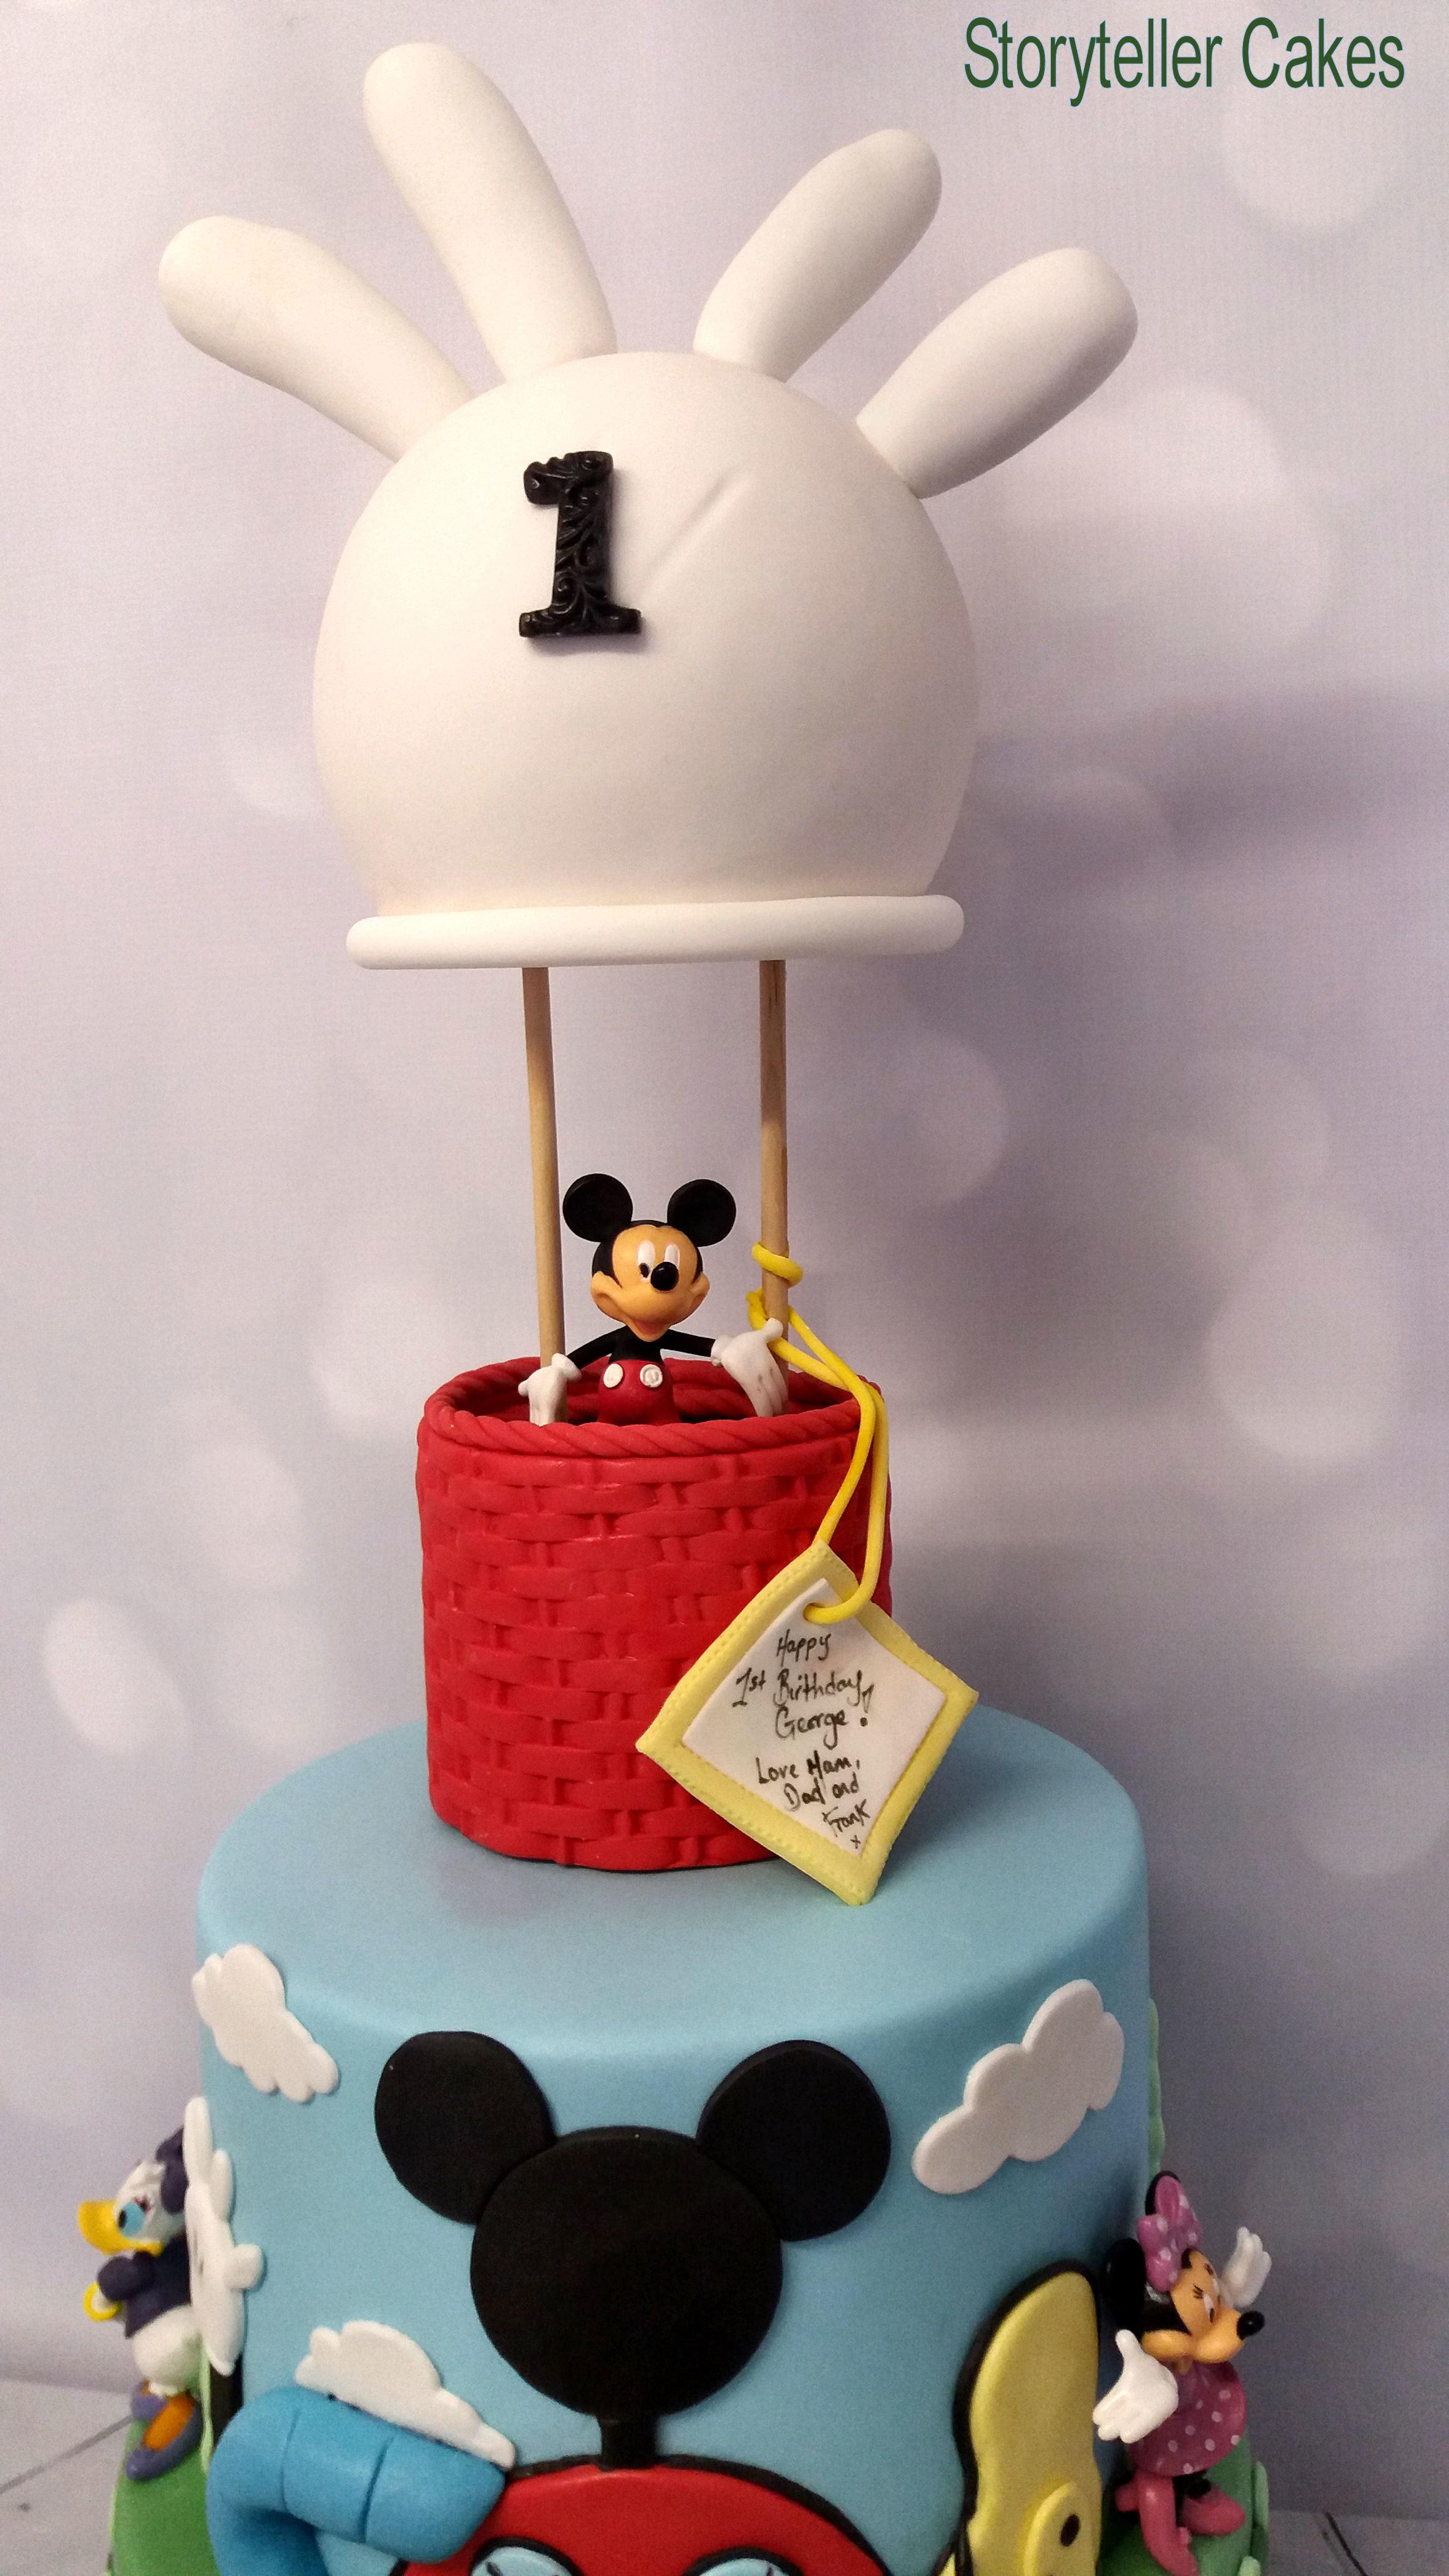 Mickey Mouse Air Balloon Cake 2.jpg